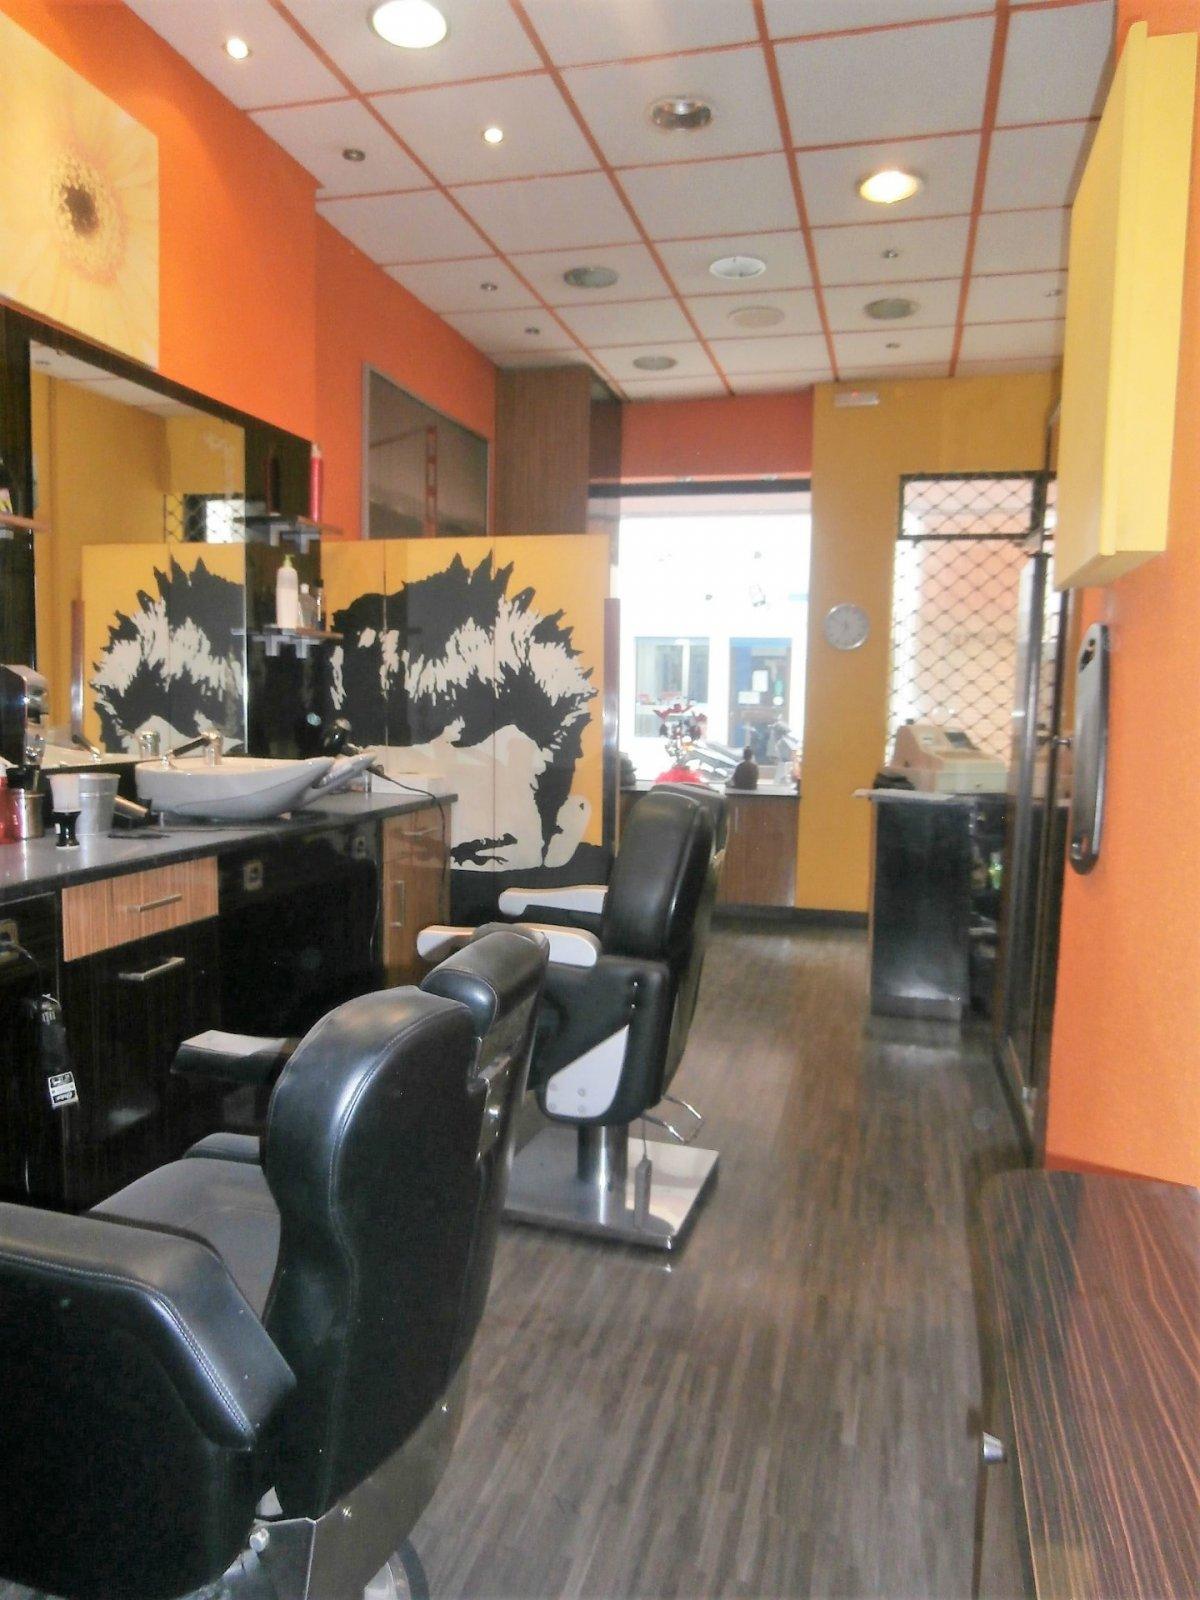 Local instalado como peluqueria - imagenInmueble3